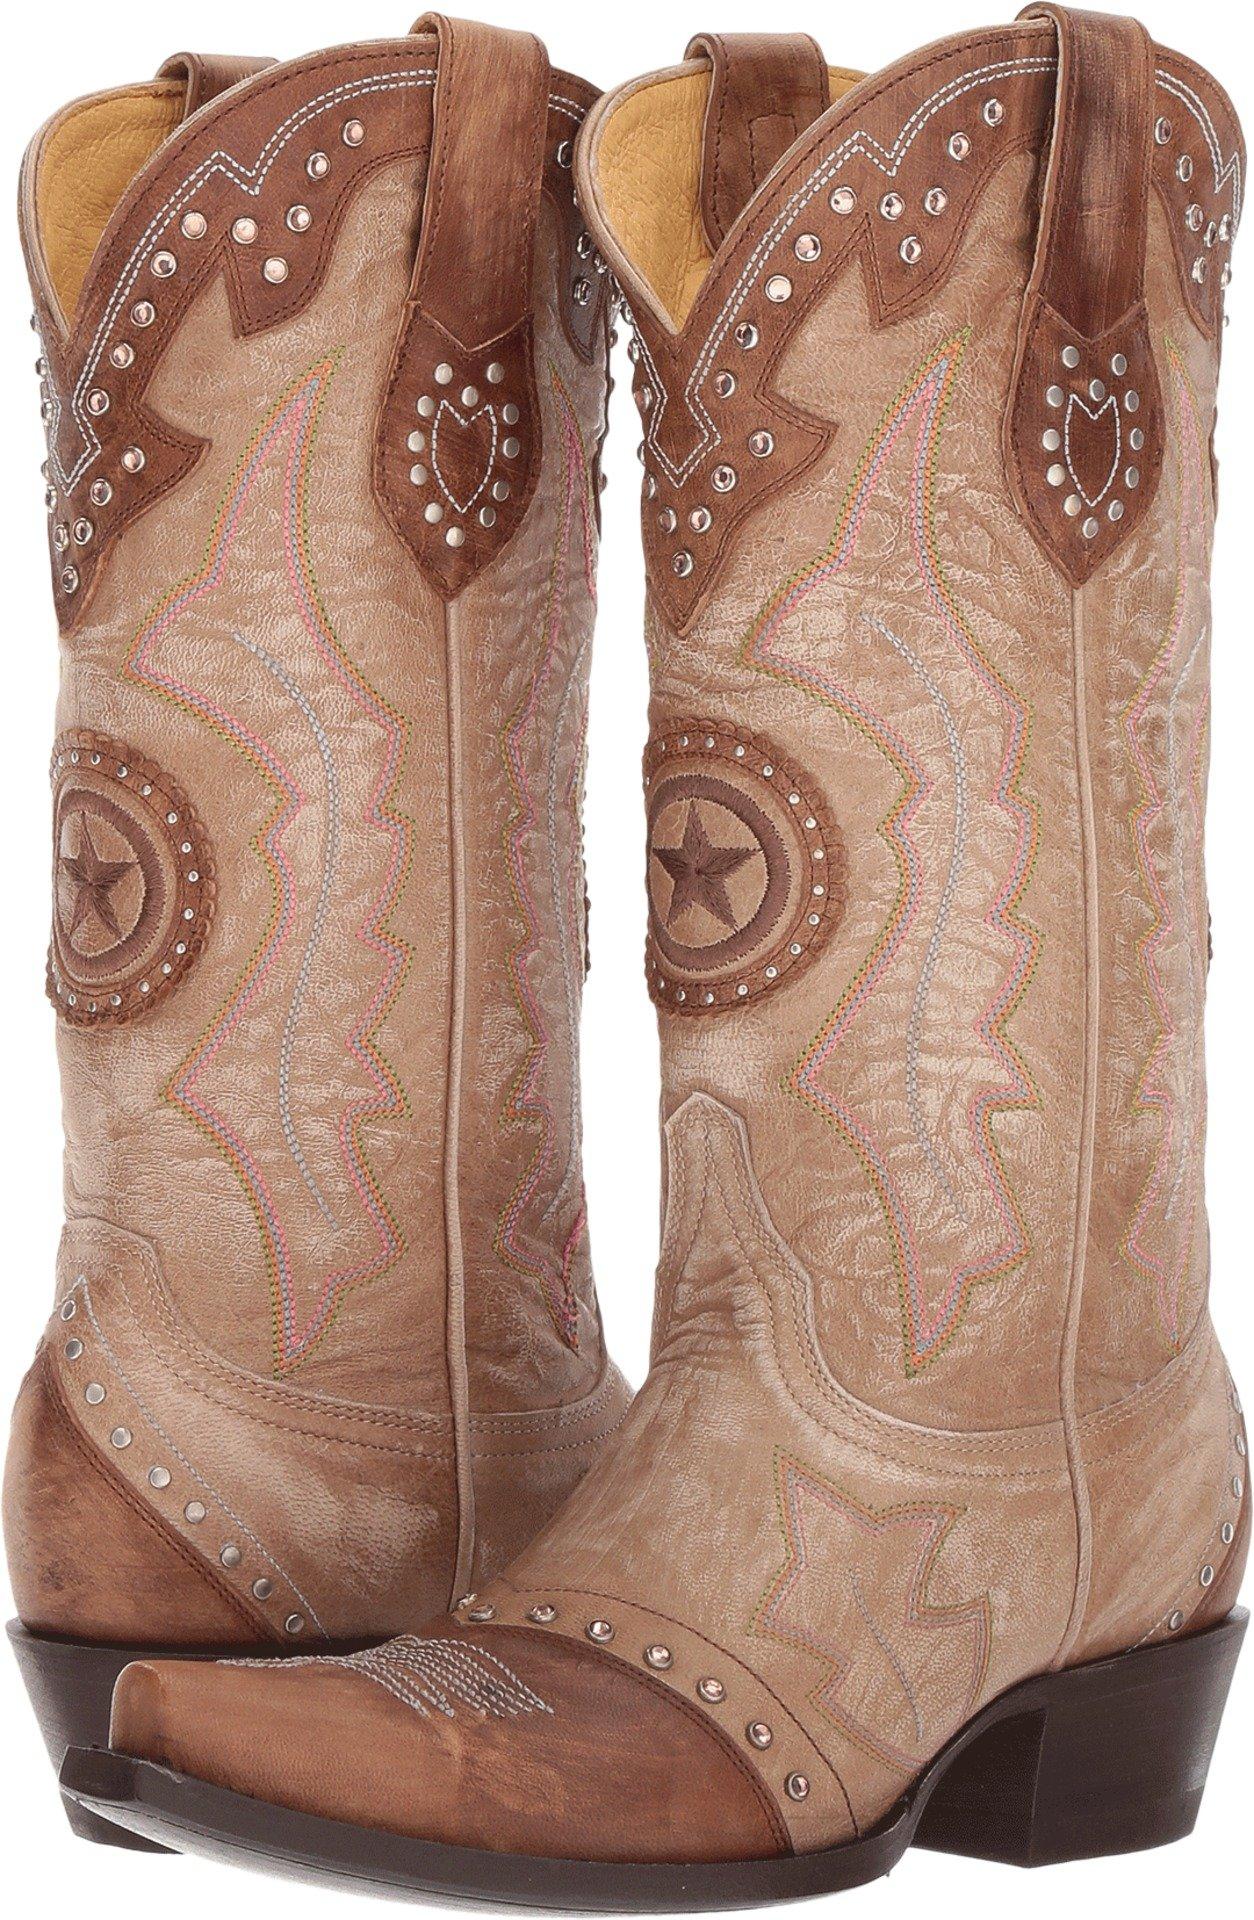 Old Gringo Women's Grafton Bone/Oryx Boot by Old Gringo (Image #1)